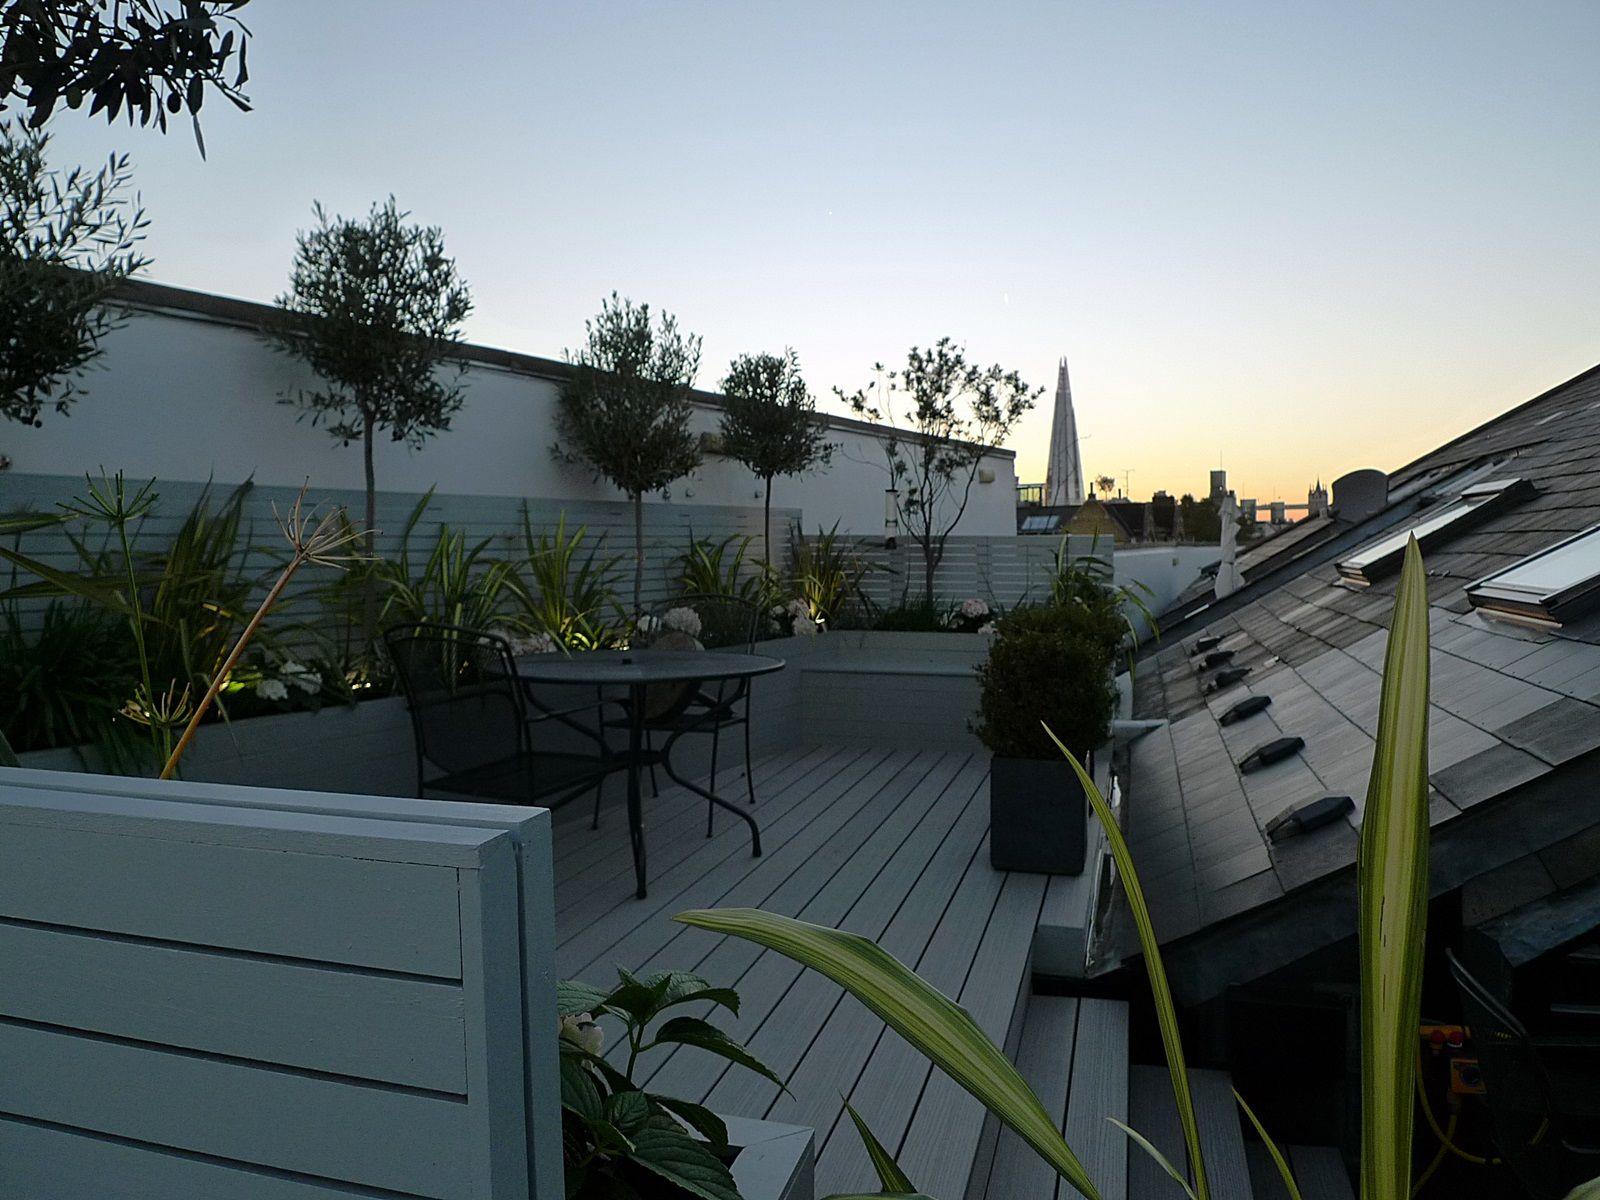 Hardwood Screen Trellis Horizontal Slats Painted Grey Raised Beds Composite Grey Decking Roof T Terrace Garden Design Garden Design London Modern Garden Design